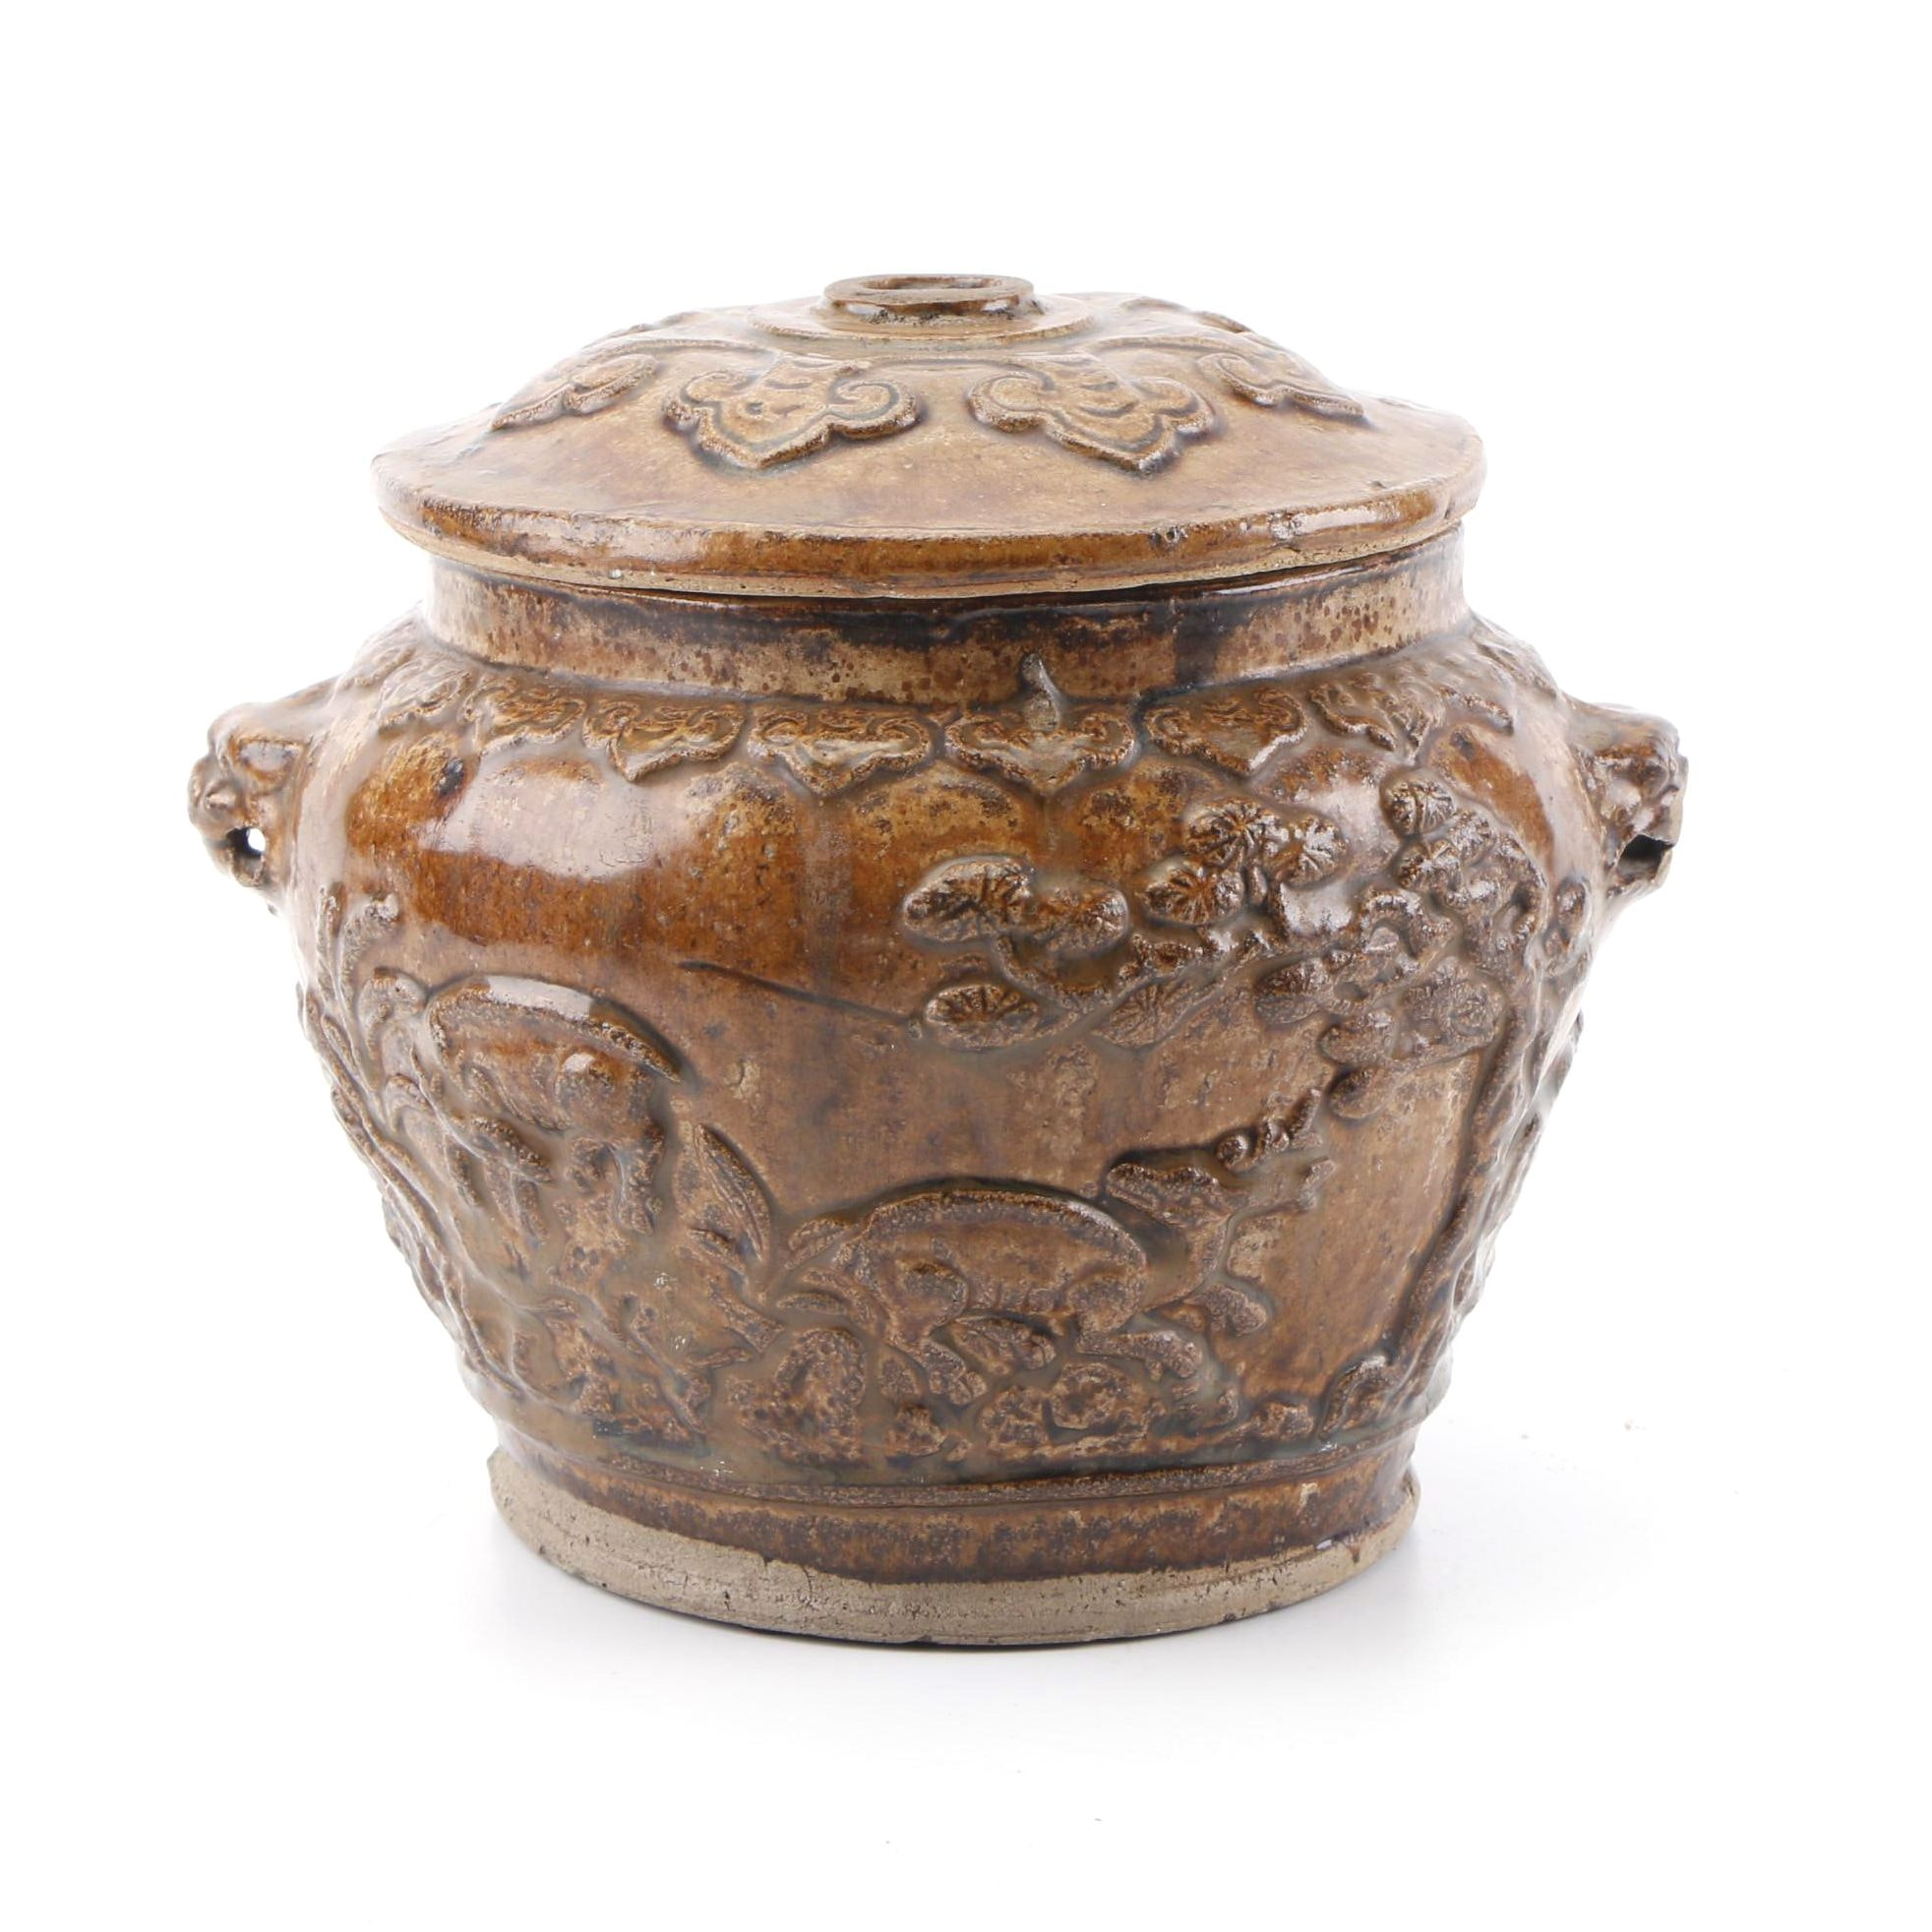 Chinese Embossed Pictorial Stoneware Lidded Jar